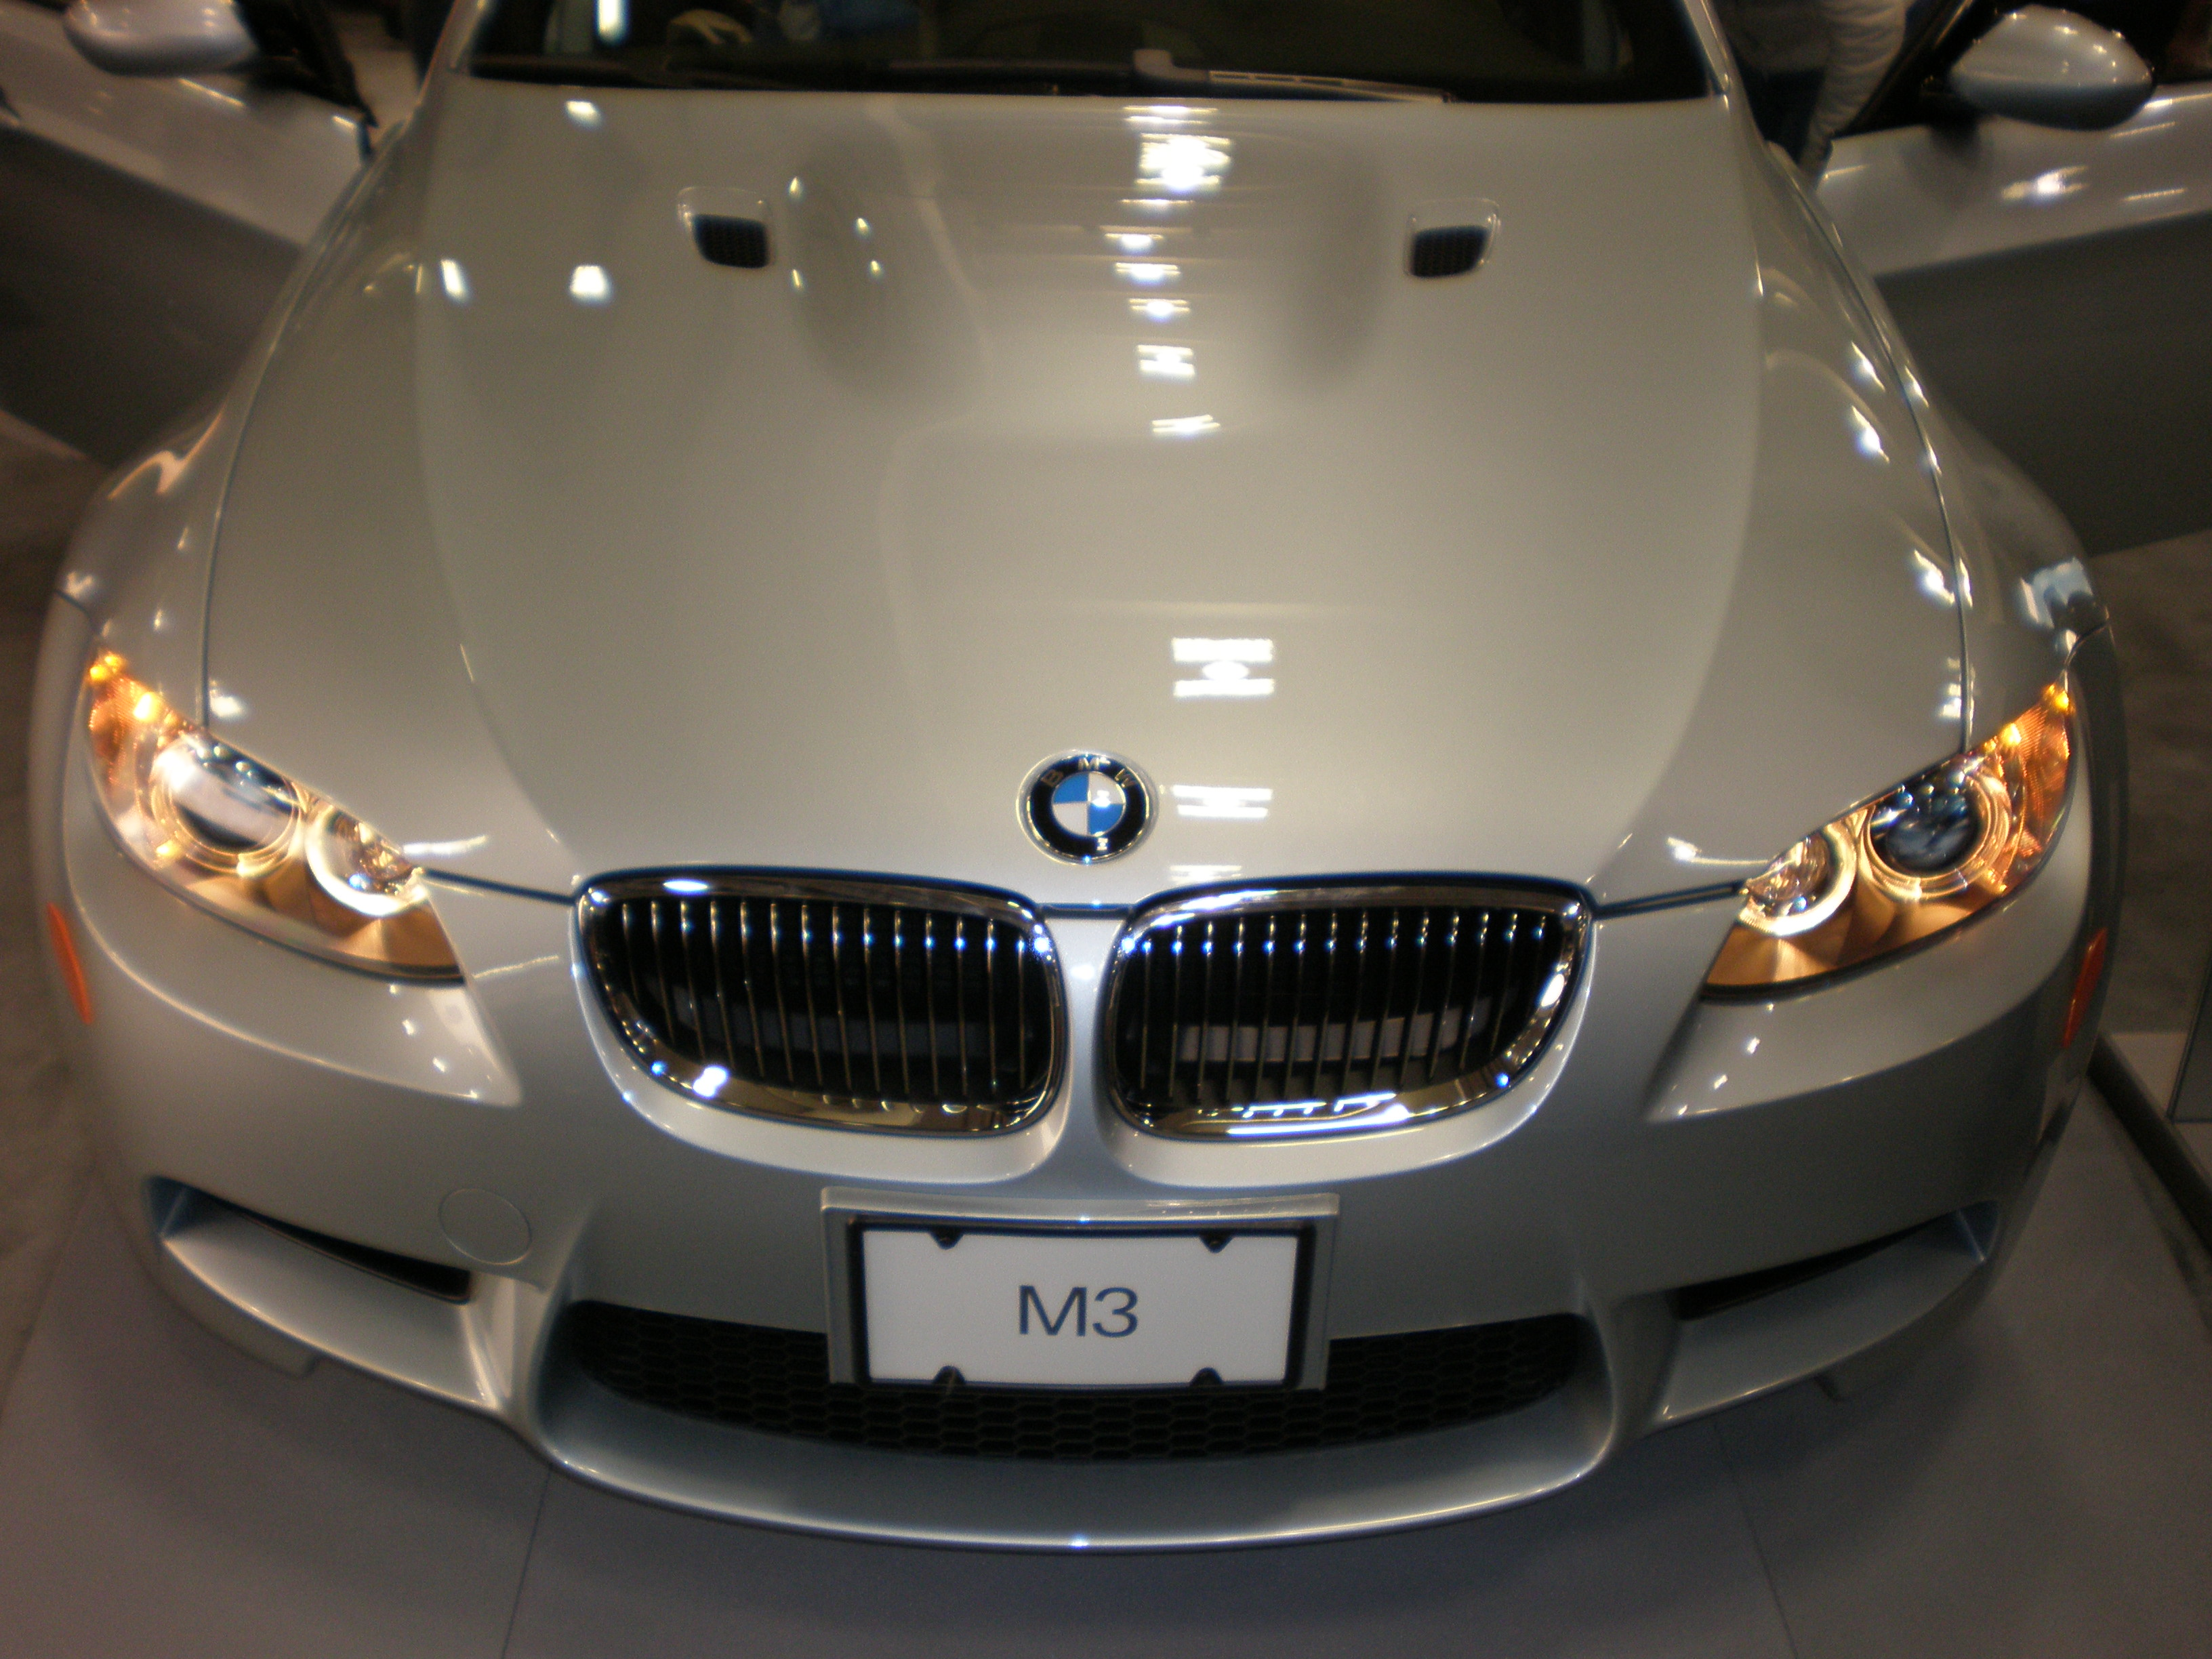 File:2009 silver BMW M3 sedan front.JPG - Wikimedia Commons